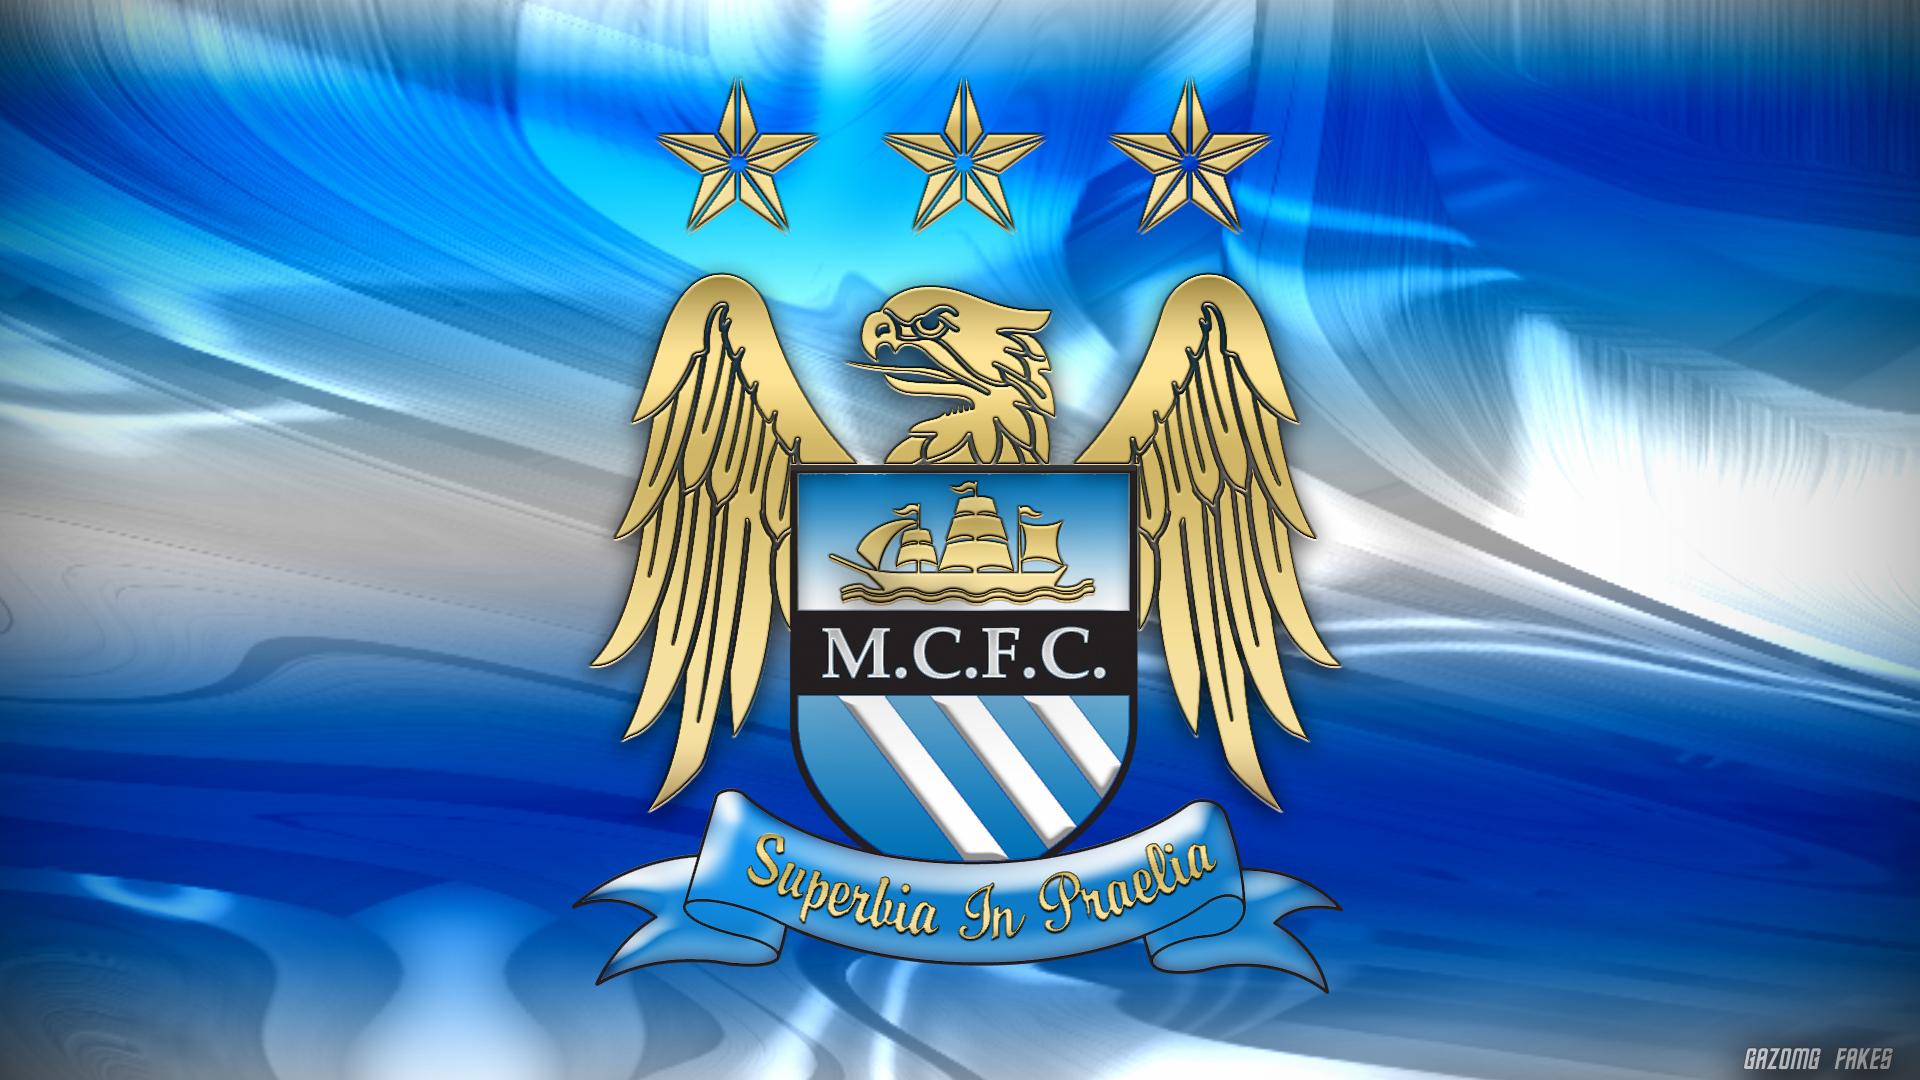 Manchester City Wallpapers 2015 - WallpaperSafari